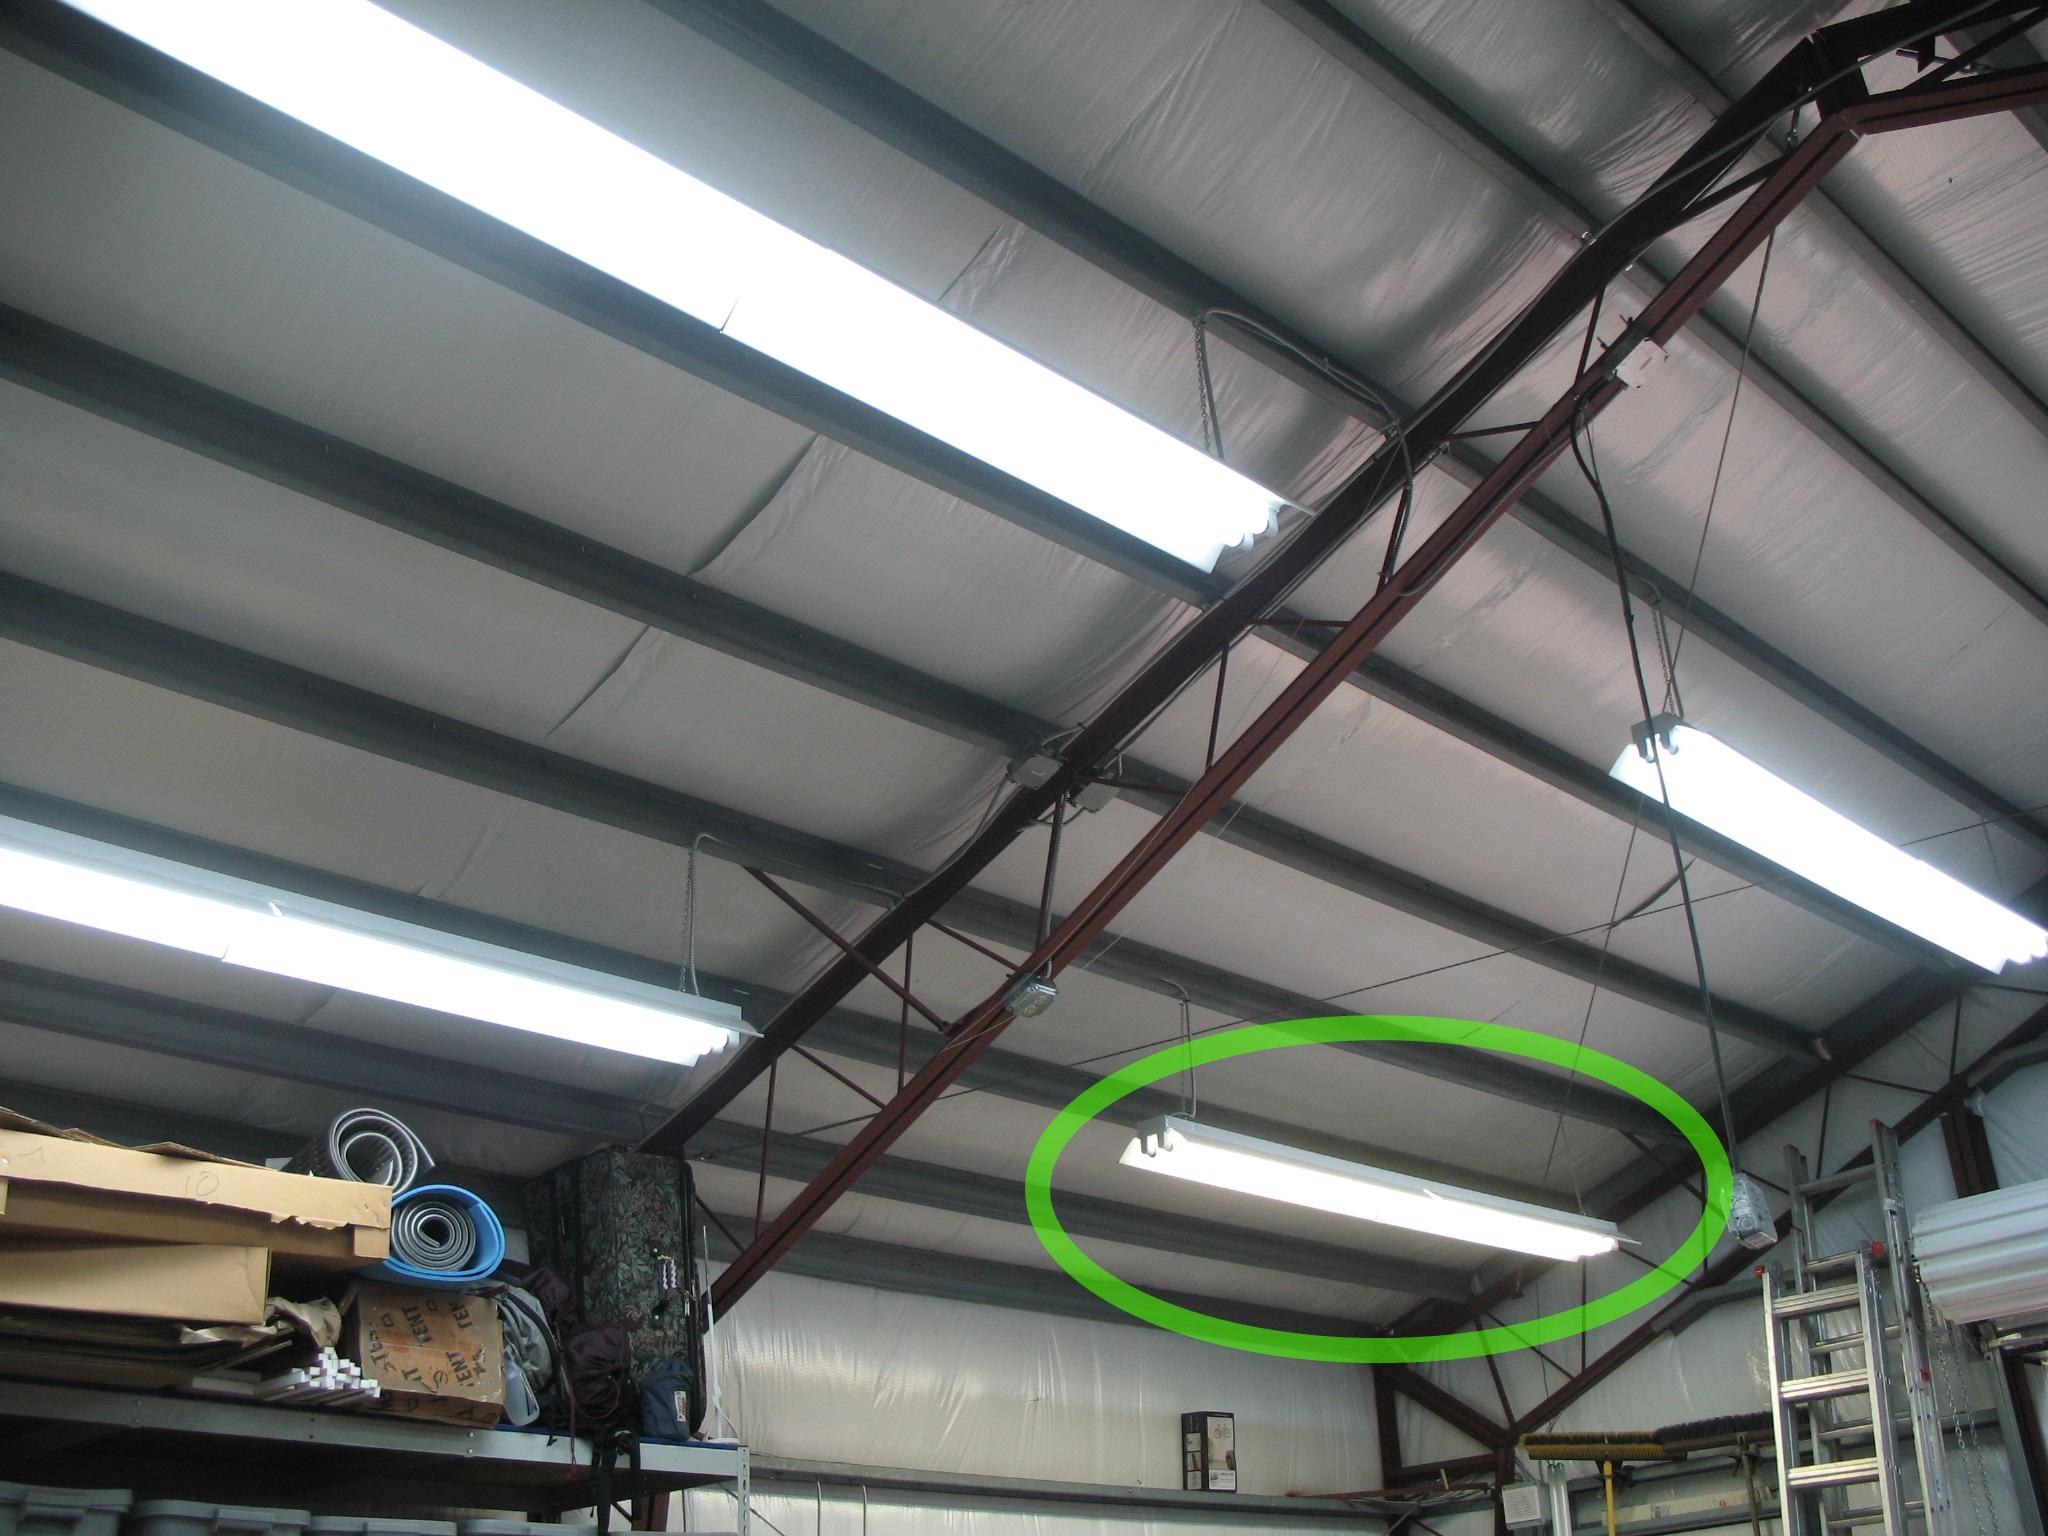 Replace Fluorescent Light Bulb